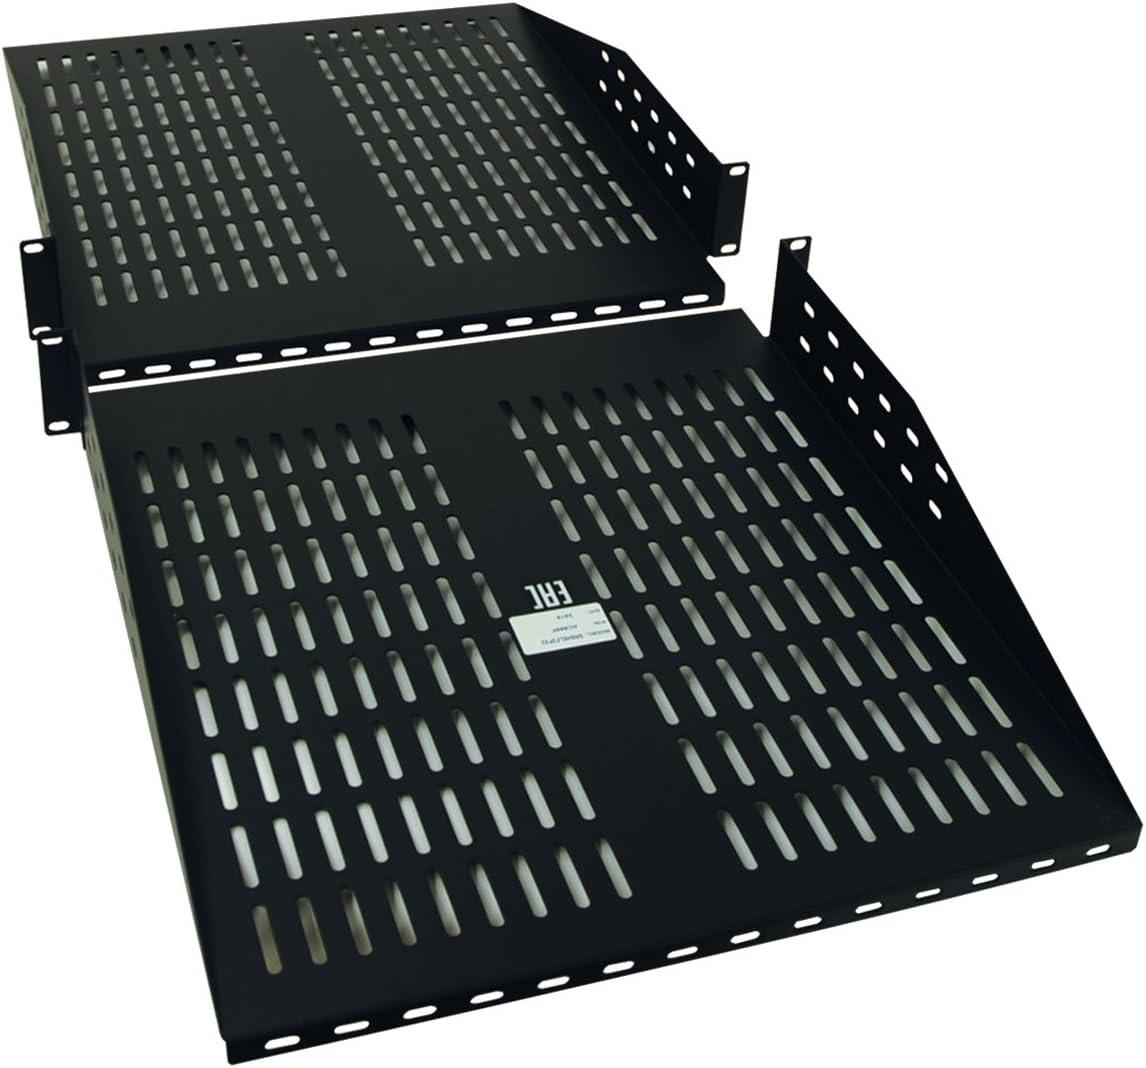 Tripp Lite Rack Cantilever Fixed Shelf 2-Post 4-Post Compatible 2URM Components SRSHELF2PX2, Black